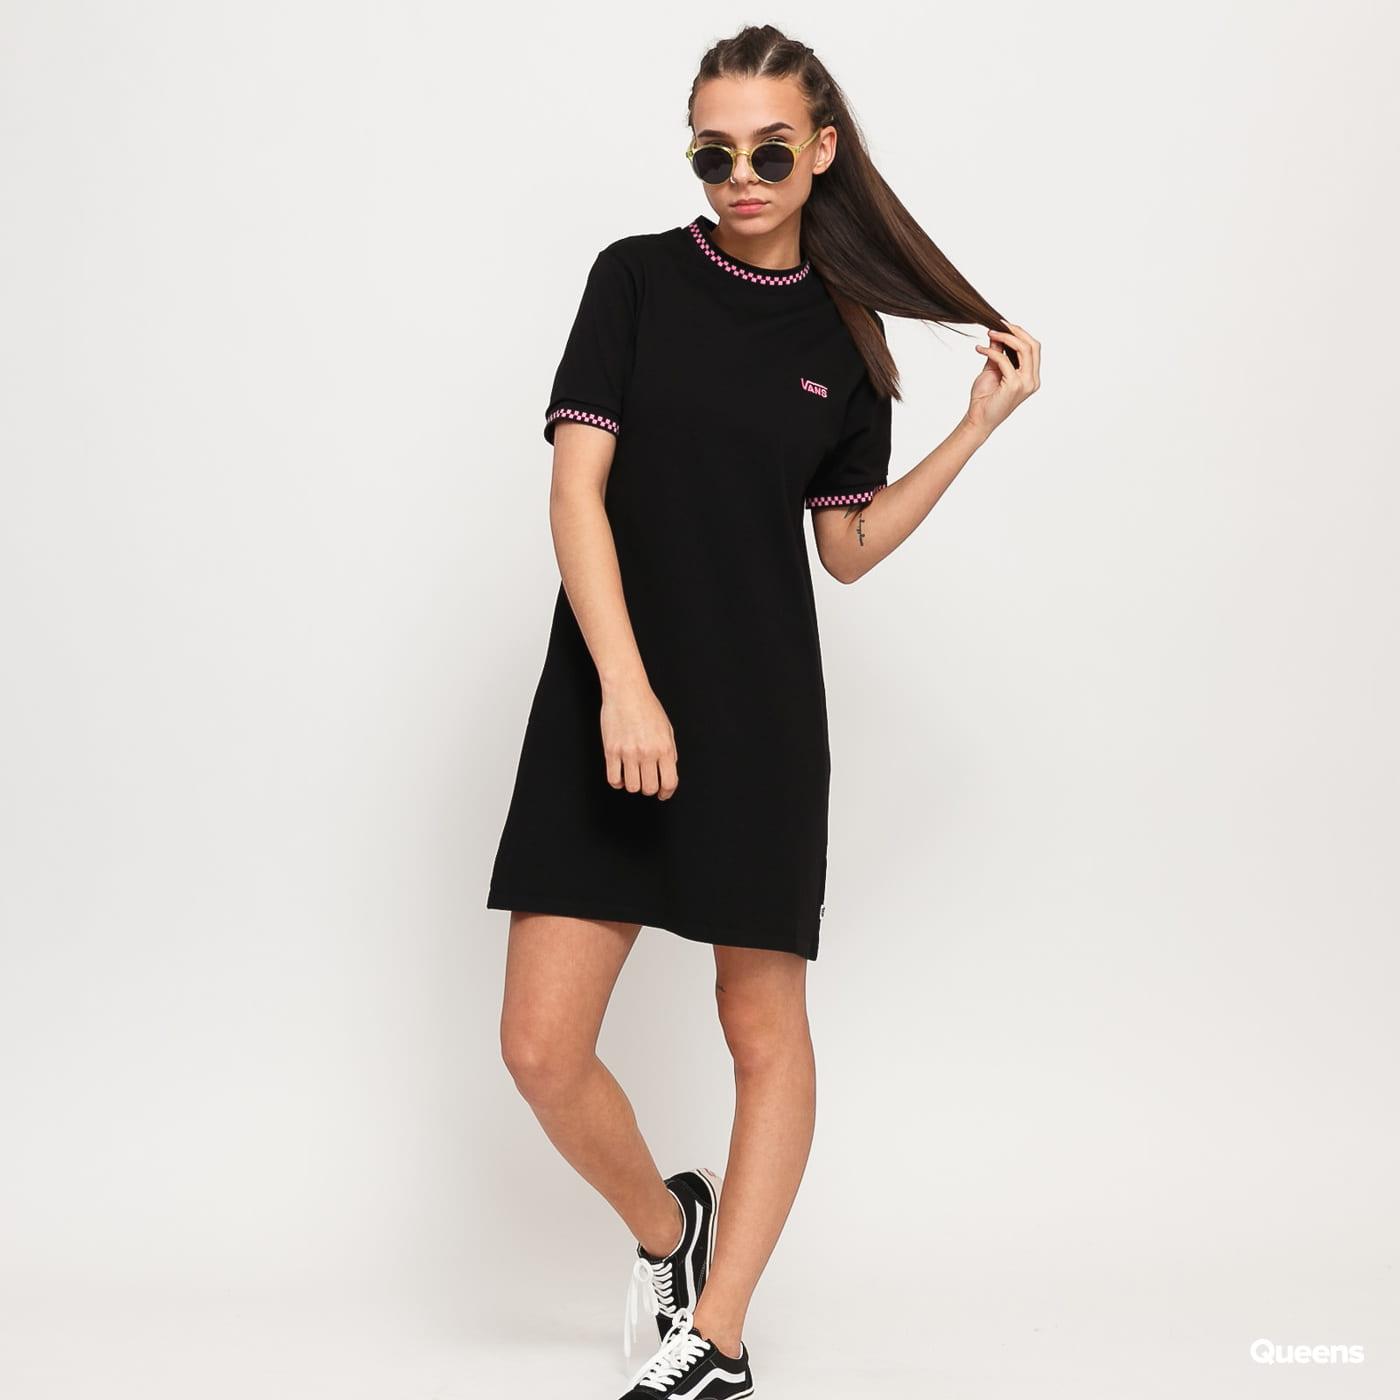 Vans WM All Stakes Dress black